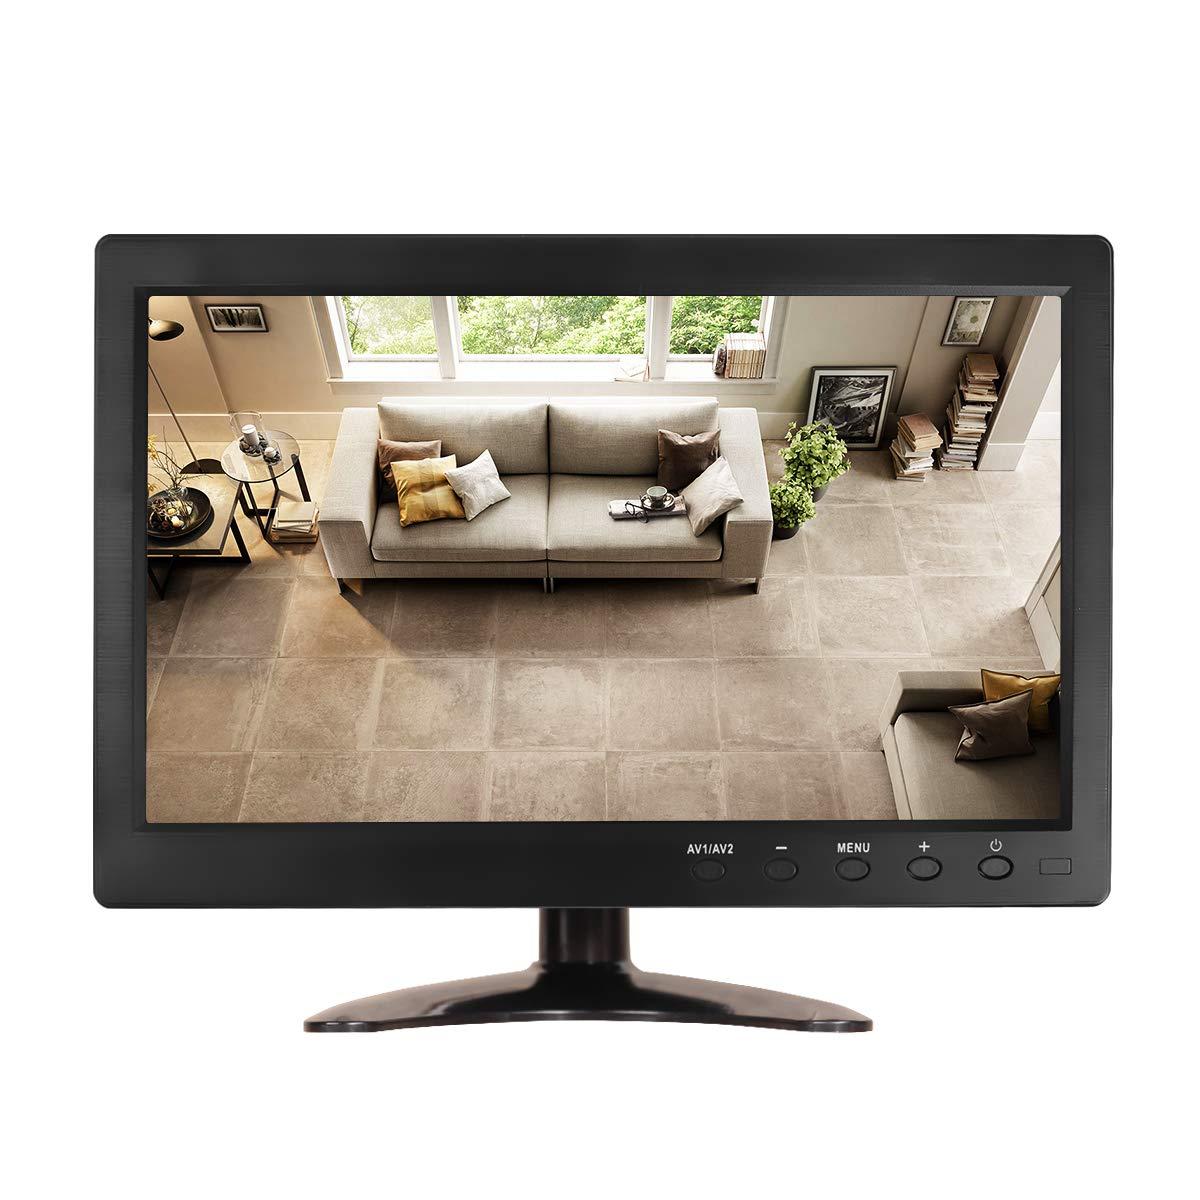 JOHNWILL 10.1 inch CCTV Security Monitor HD 1366X768 Portable HDMI Monitor with HDMI/VGA/AV-BNC/USB Input for PC, Laptop,TV Box,CCTV, Camera,Home Security System, Raspberry PI